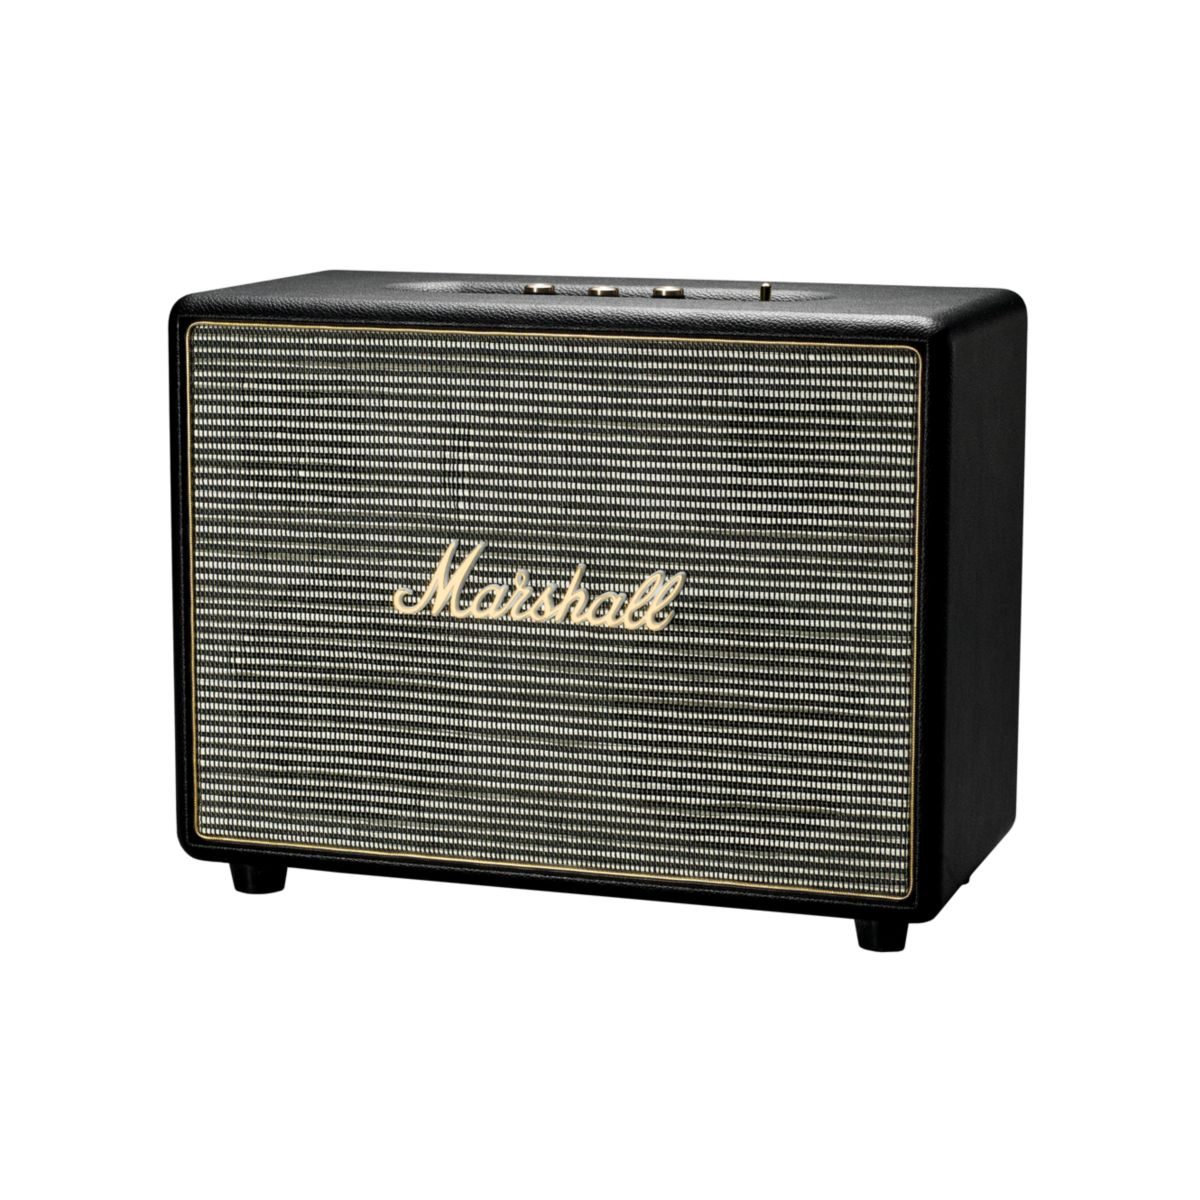 Enceinte Bluetooth MARSHALL Woburn noir